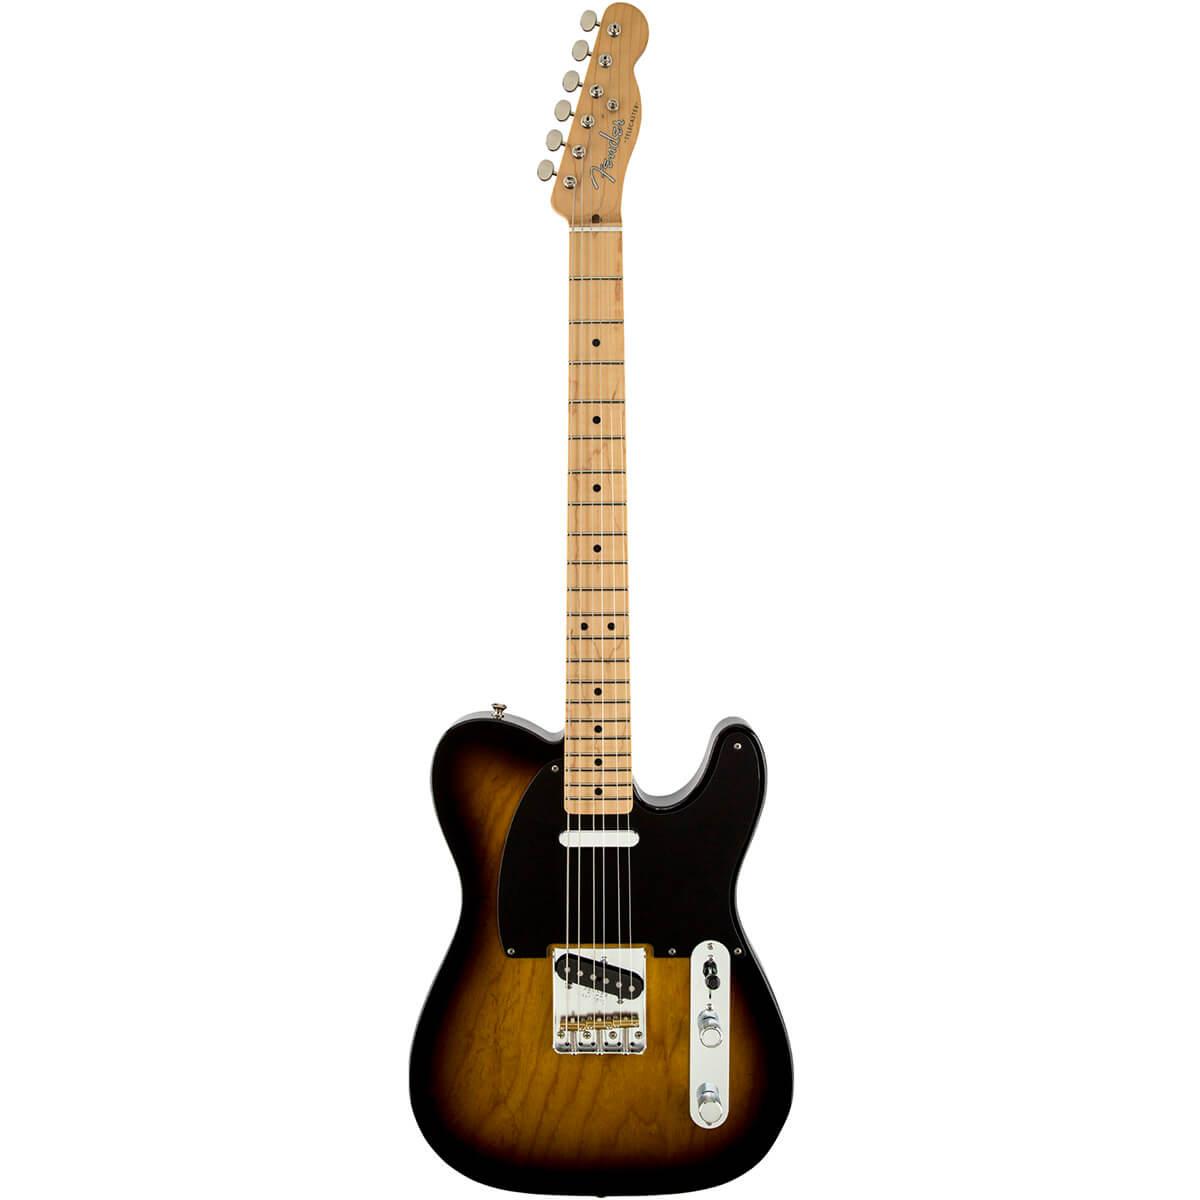 Fender ClassicPlayerBajaTelecaster,MN,2TS el-guitar 2-tonesunburst